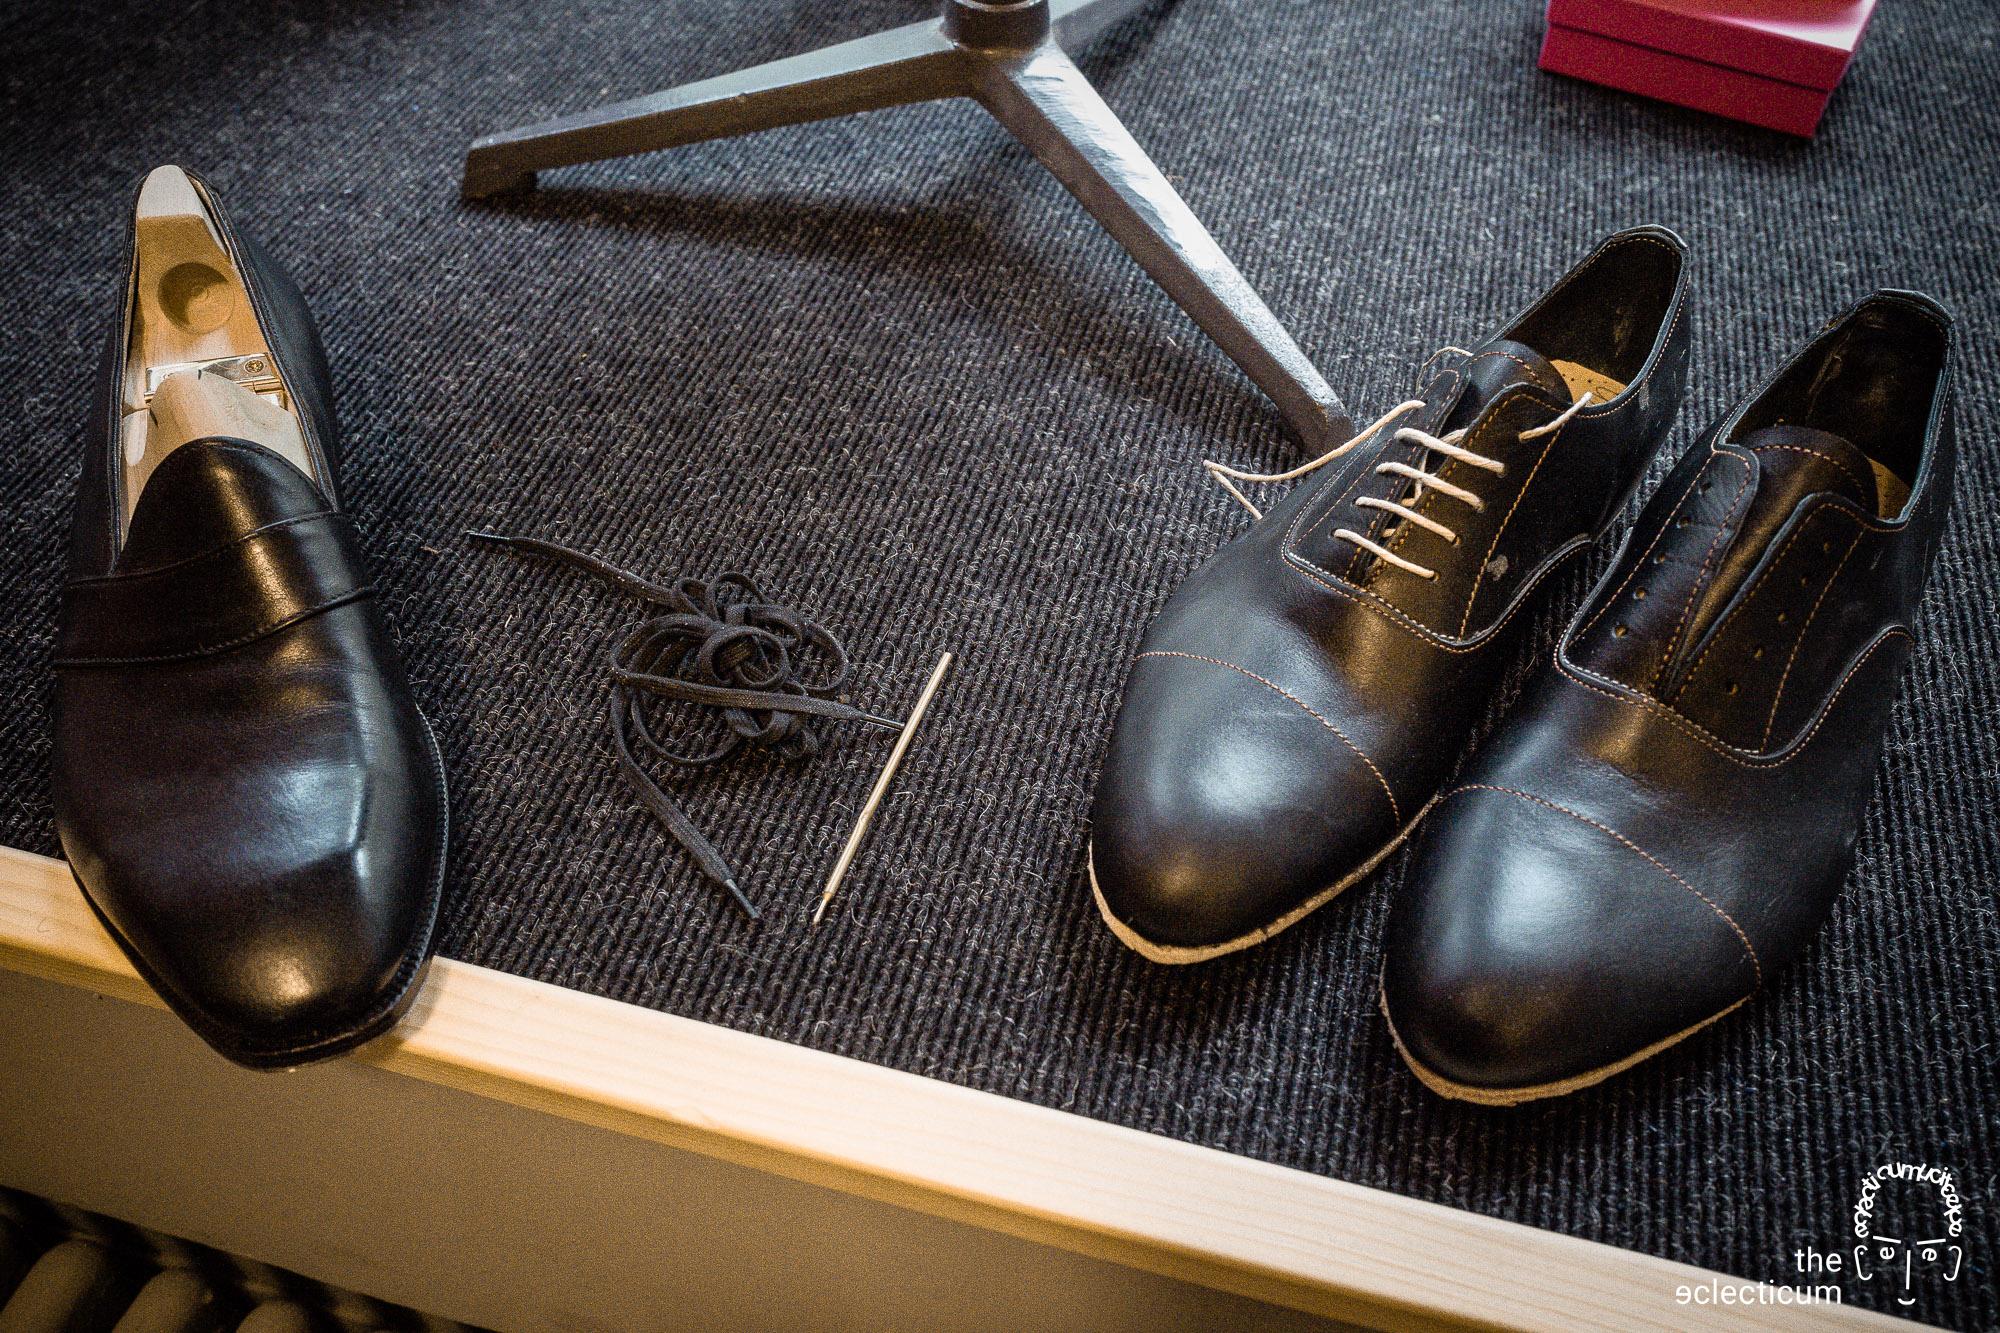 Atelier Leonard Kahlcke shoes